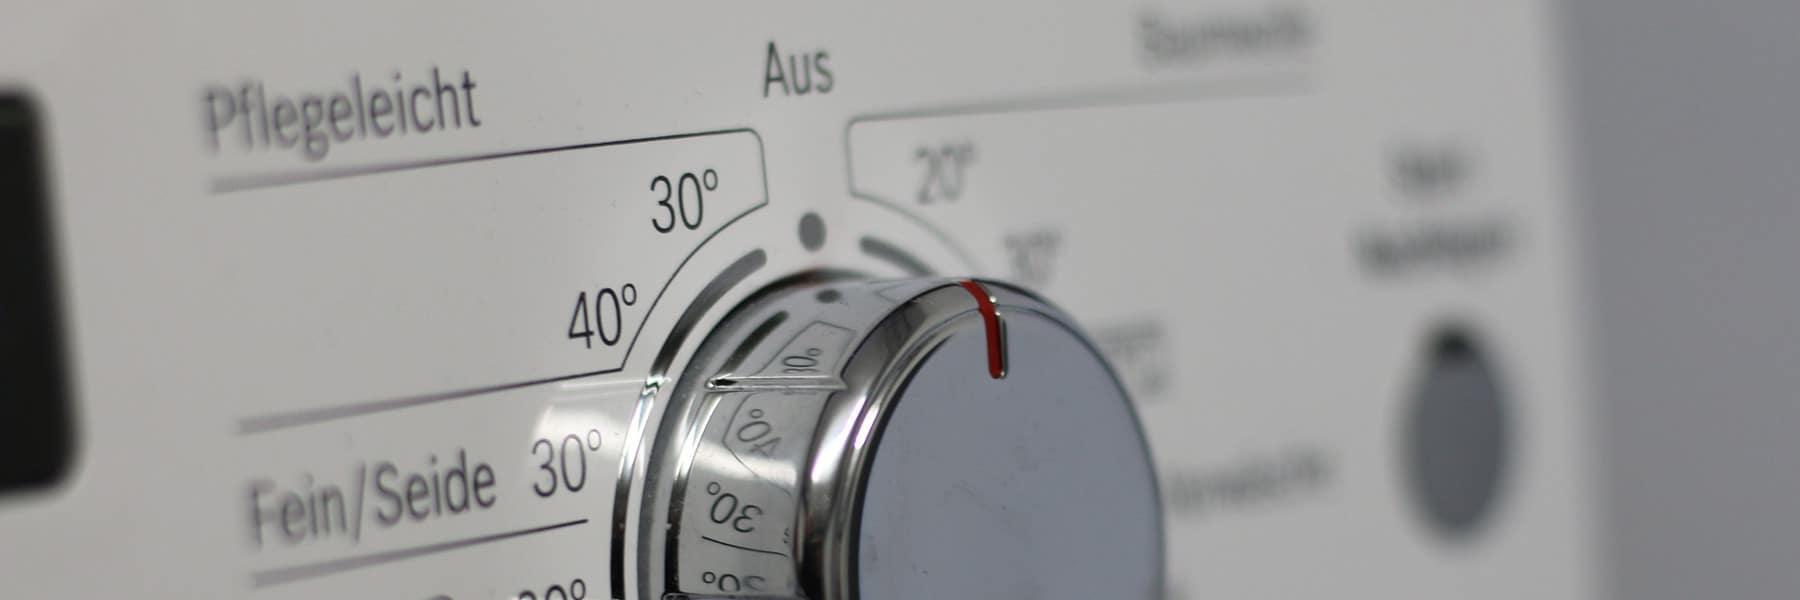 HomeKit informiert über fertige Waschmaschine